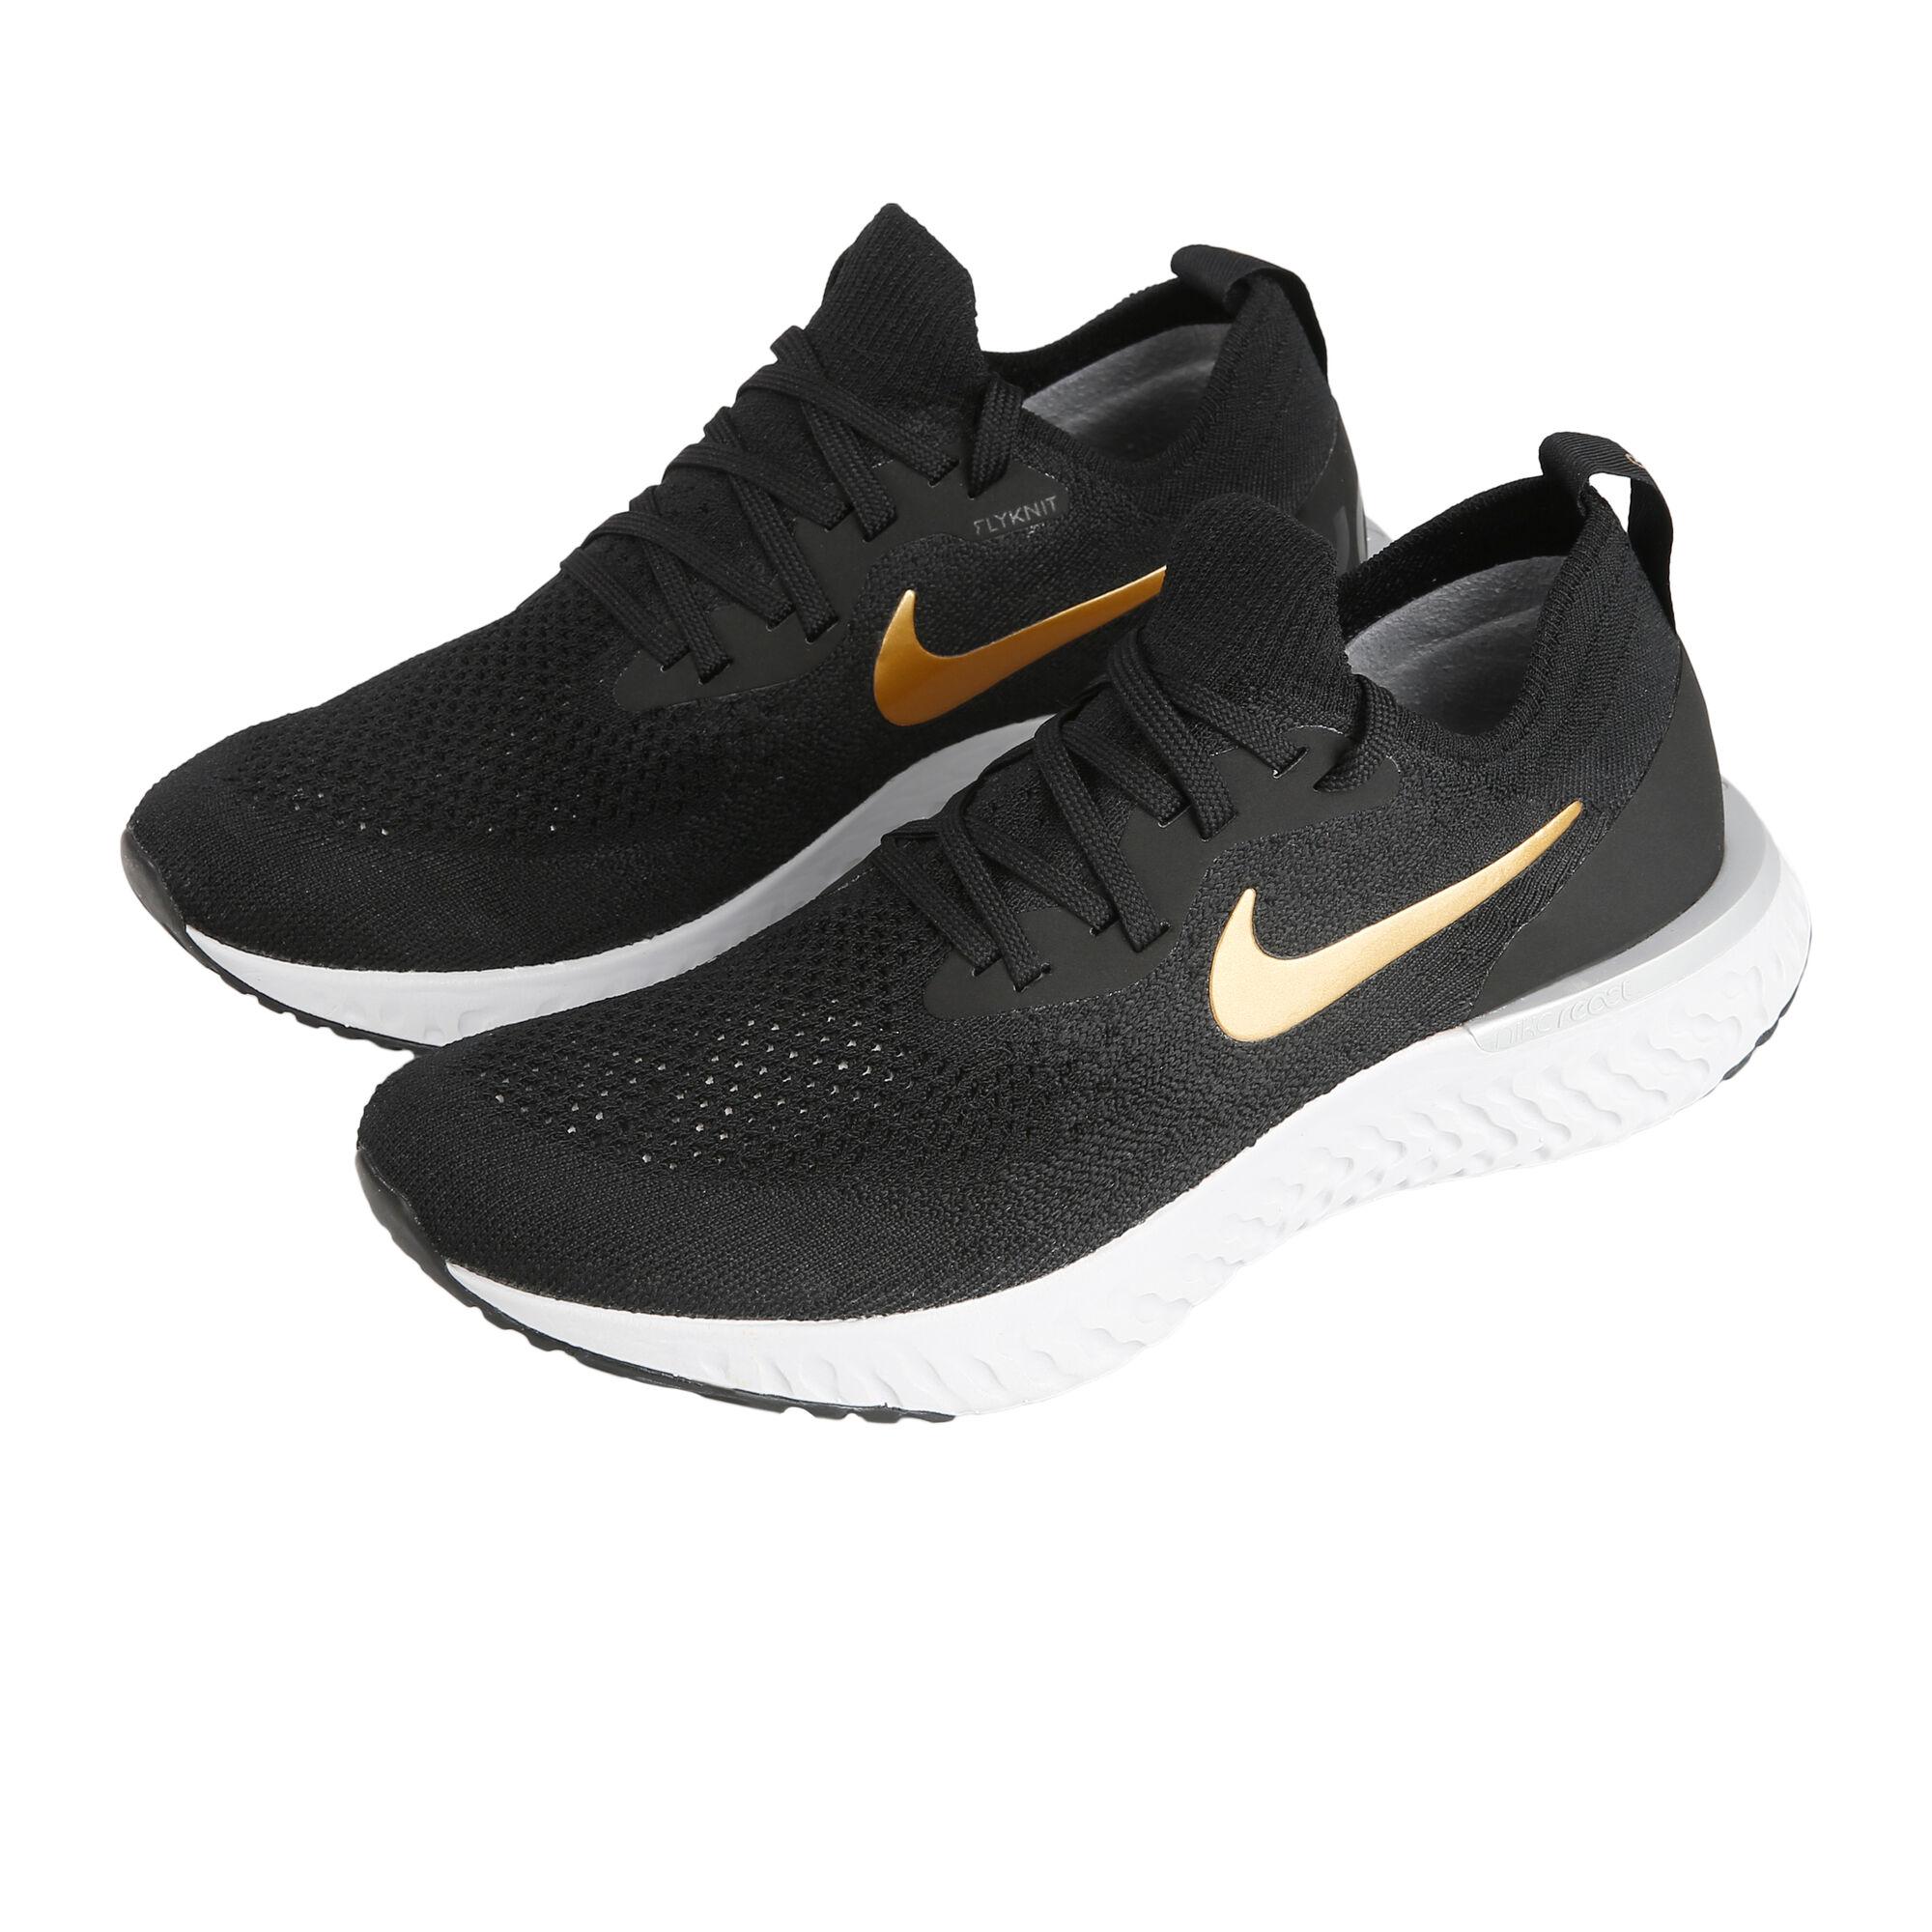 sports shoes 93b0a 5d702 ... Nike · Nike · Nike · Nike. Epic React Flyknit Women ...